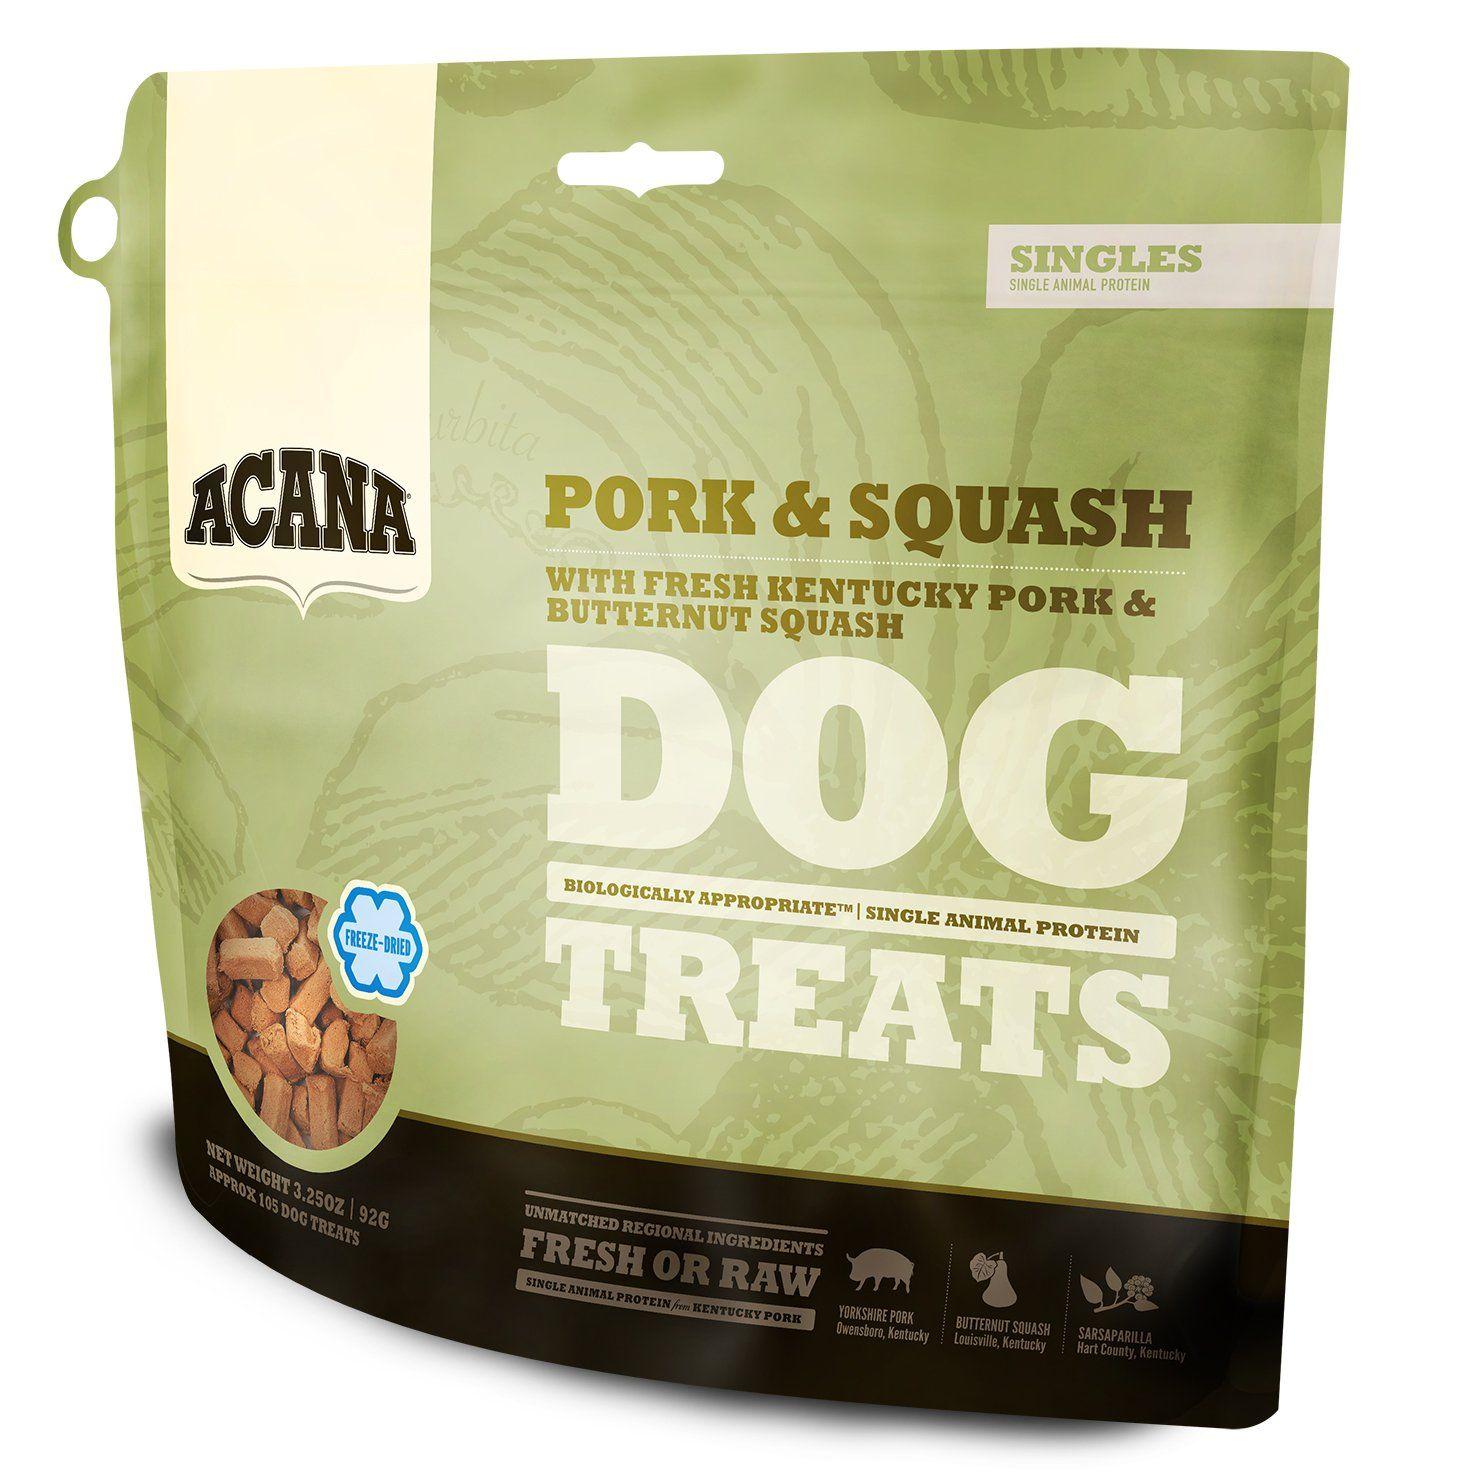 Orijen Acana Pork and Squash FreezeDried Dog Treats 3.25